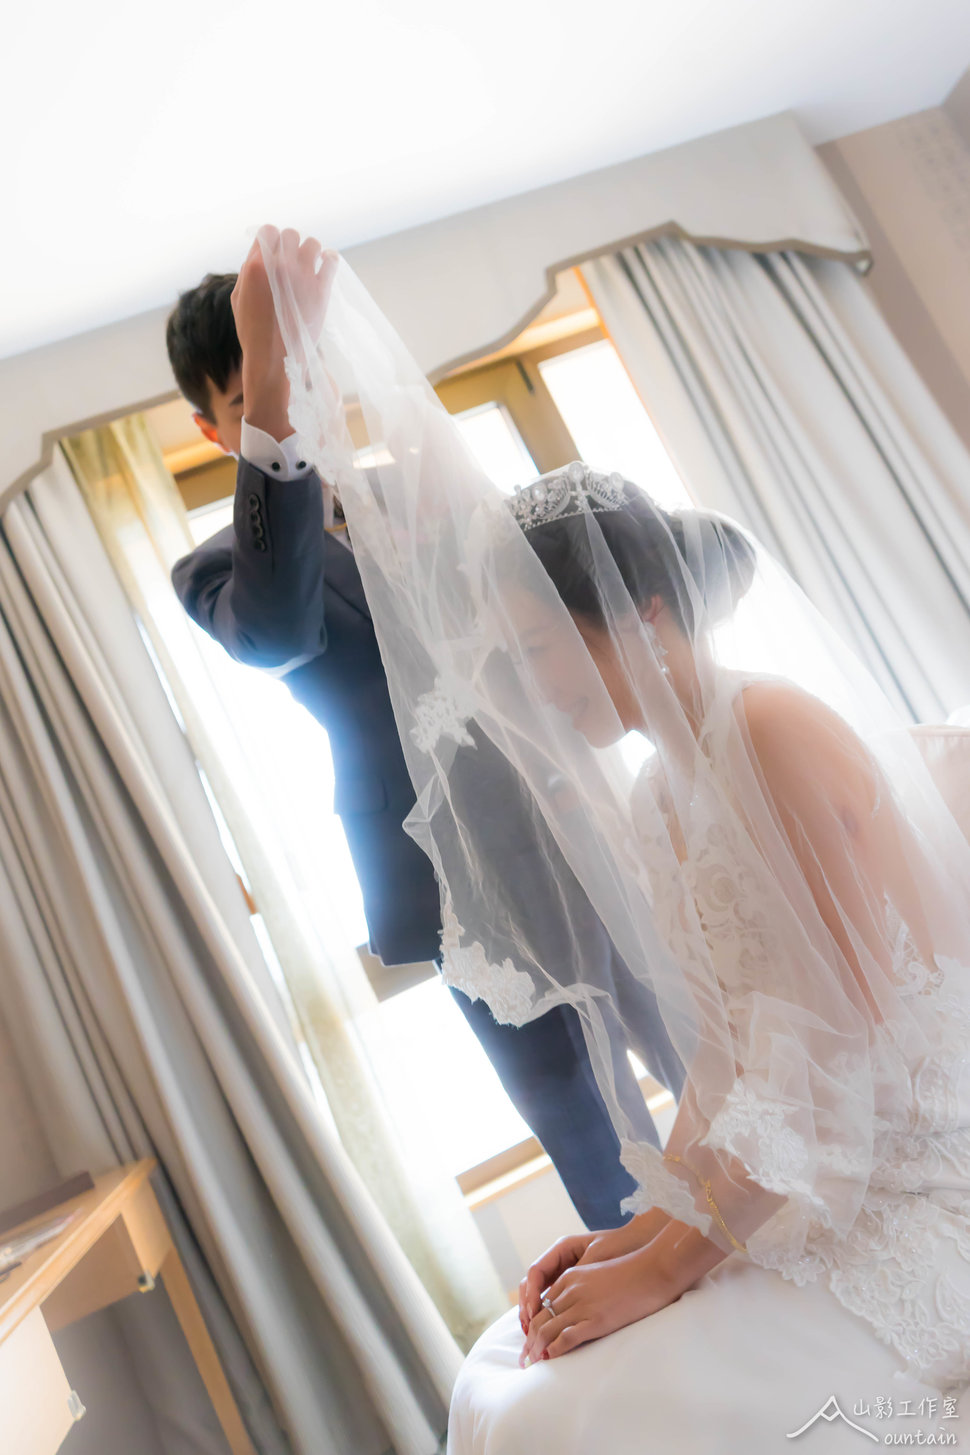 wedding-D163-Mountain studio - 山影工作室 MOUNTAIN《結婚吧》